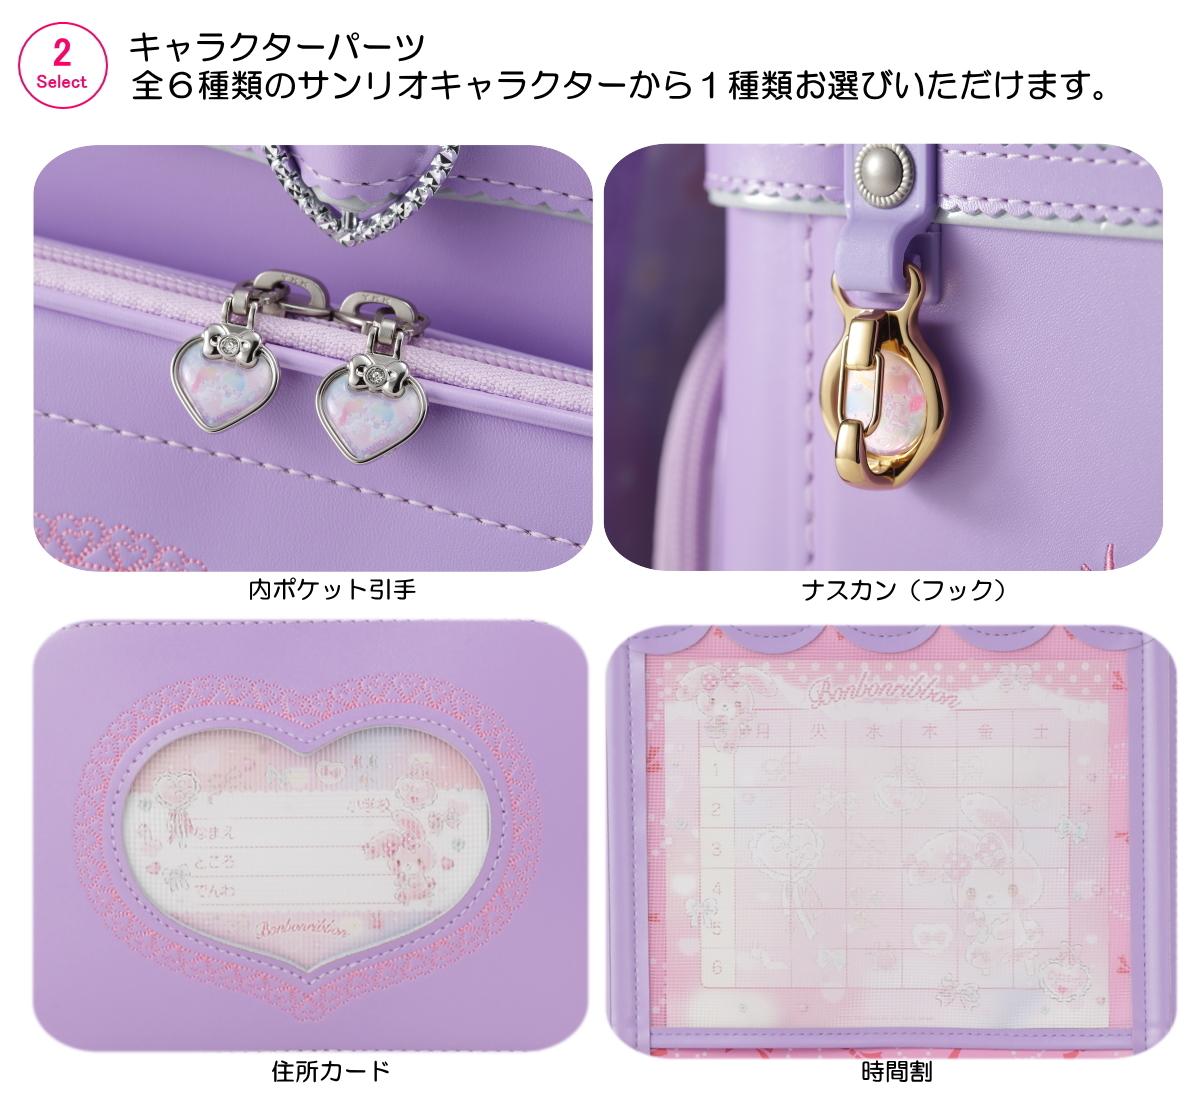 Lavender bag RETRO KITTY